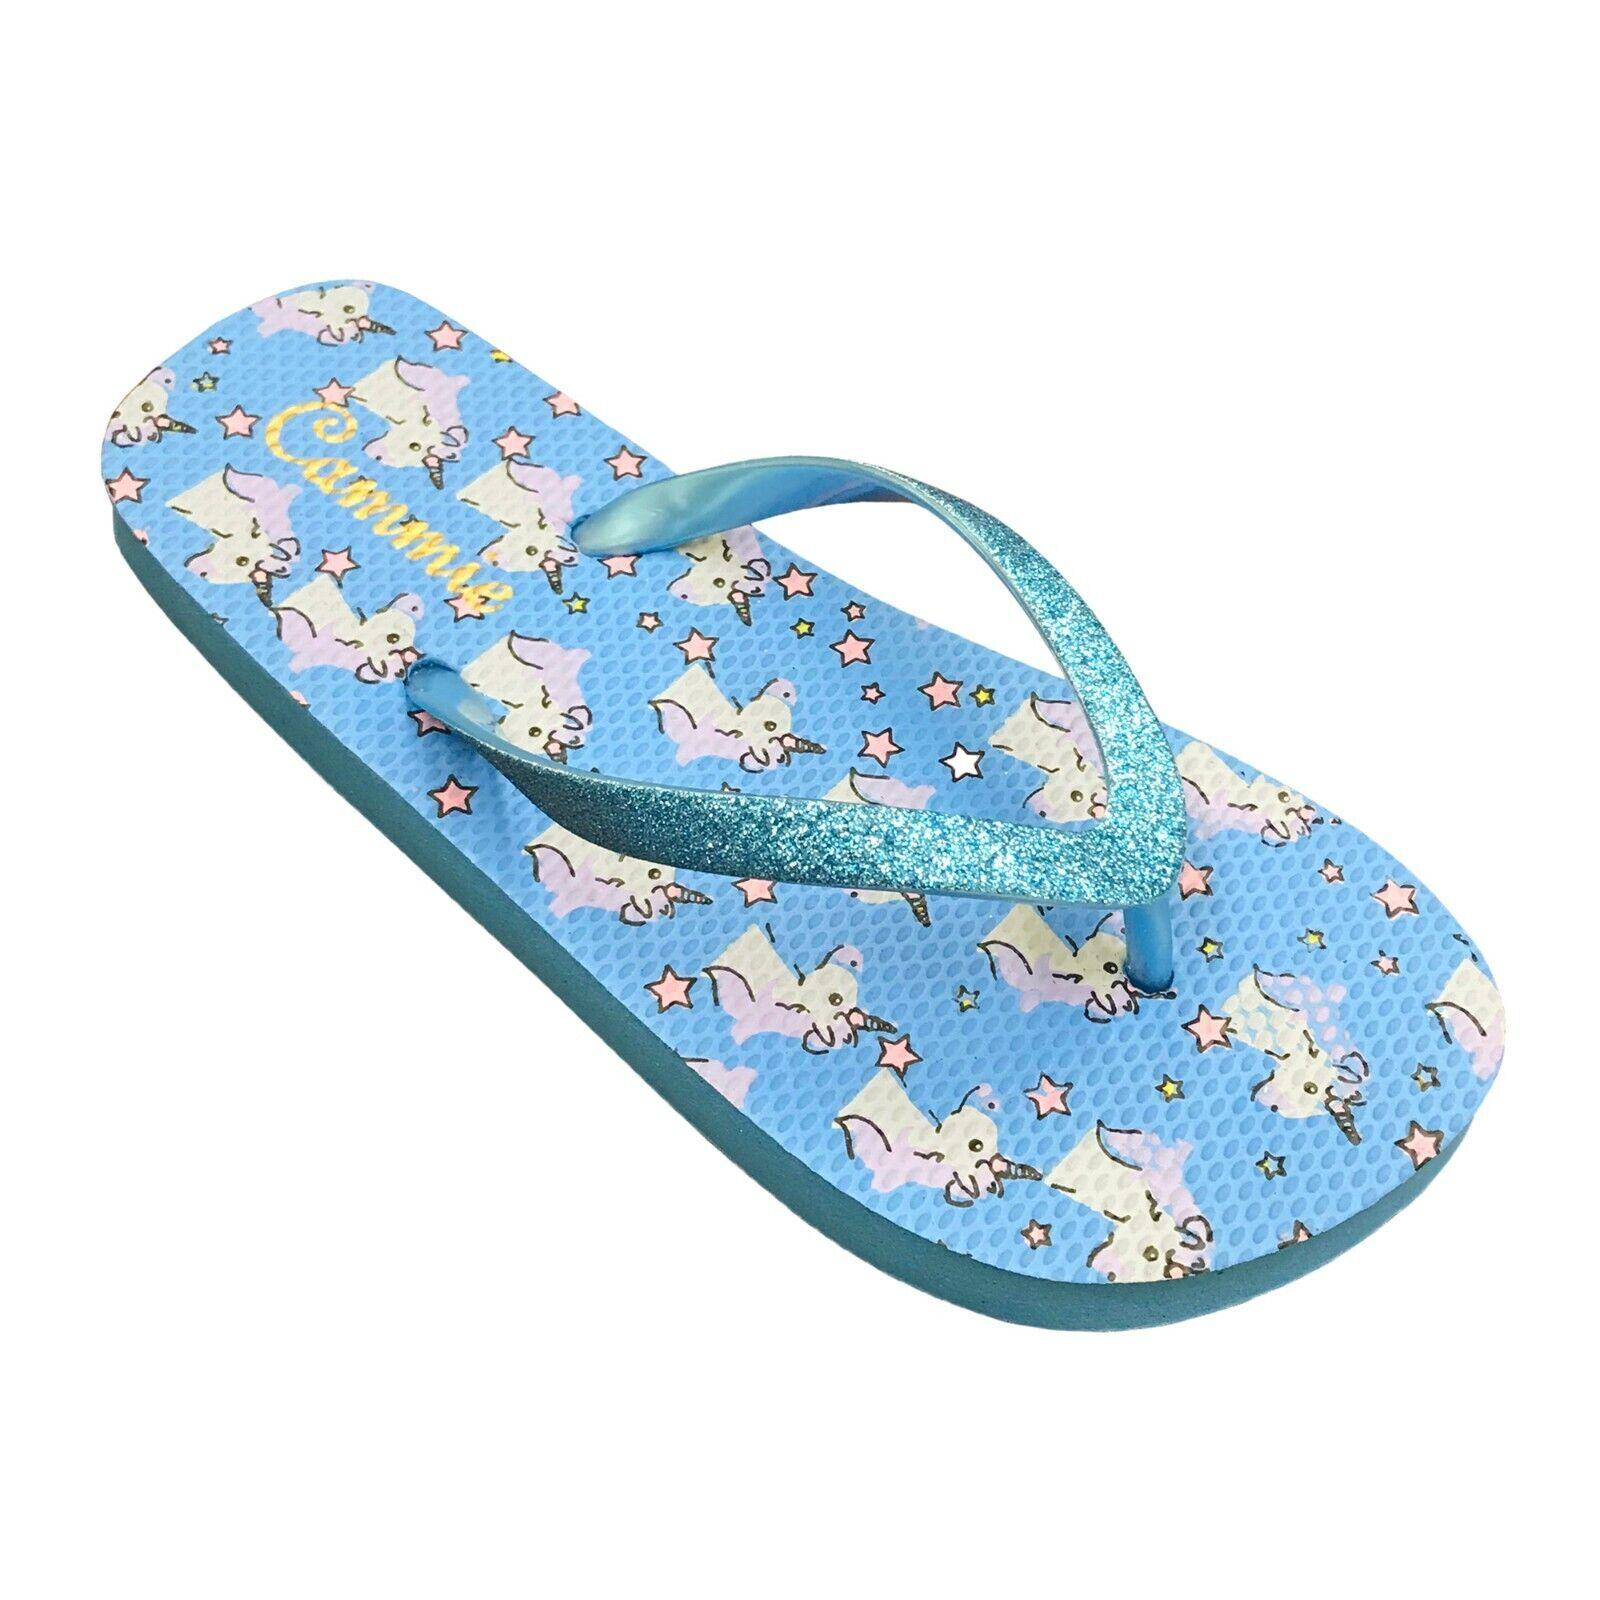 NEW Kids Sandals Girls Unicorn Print Glitter Thong Flip Flops Youth Size 12 to 4